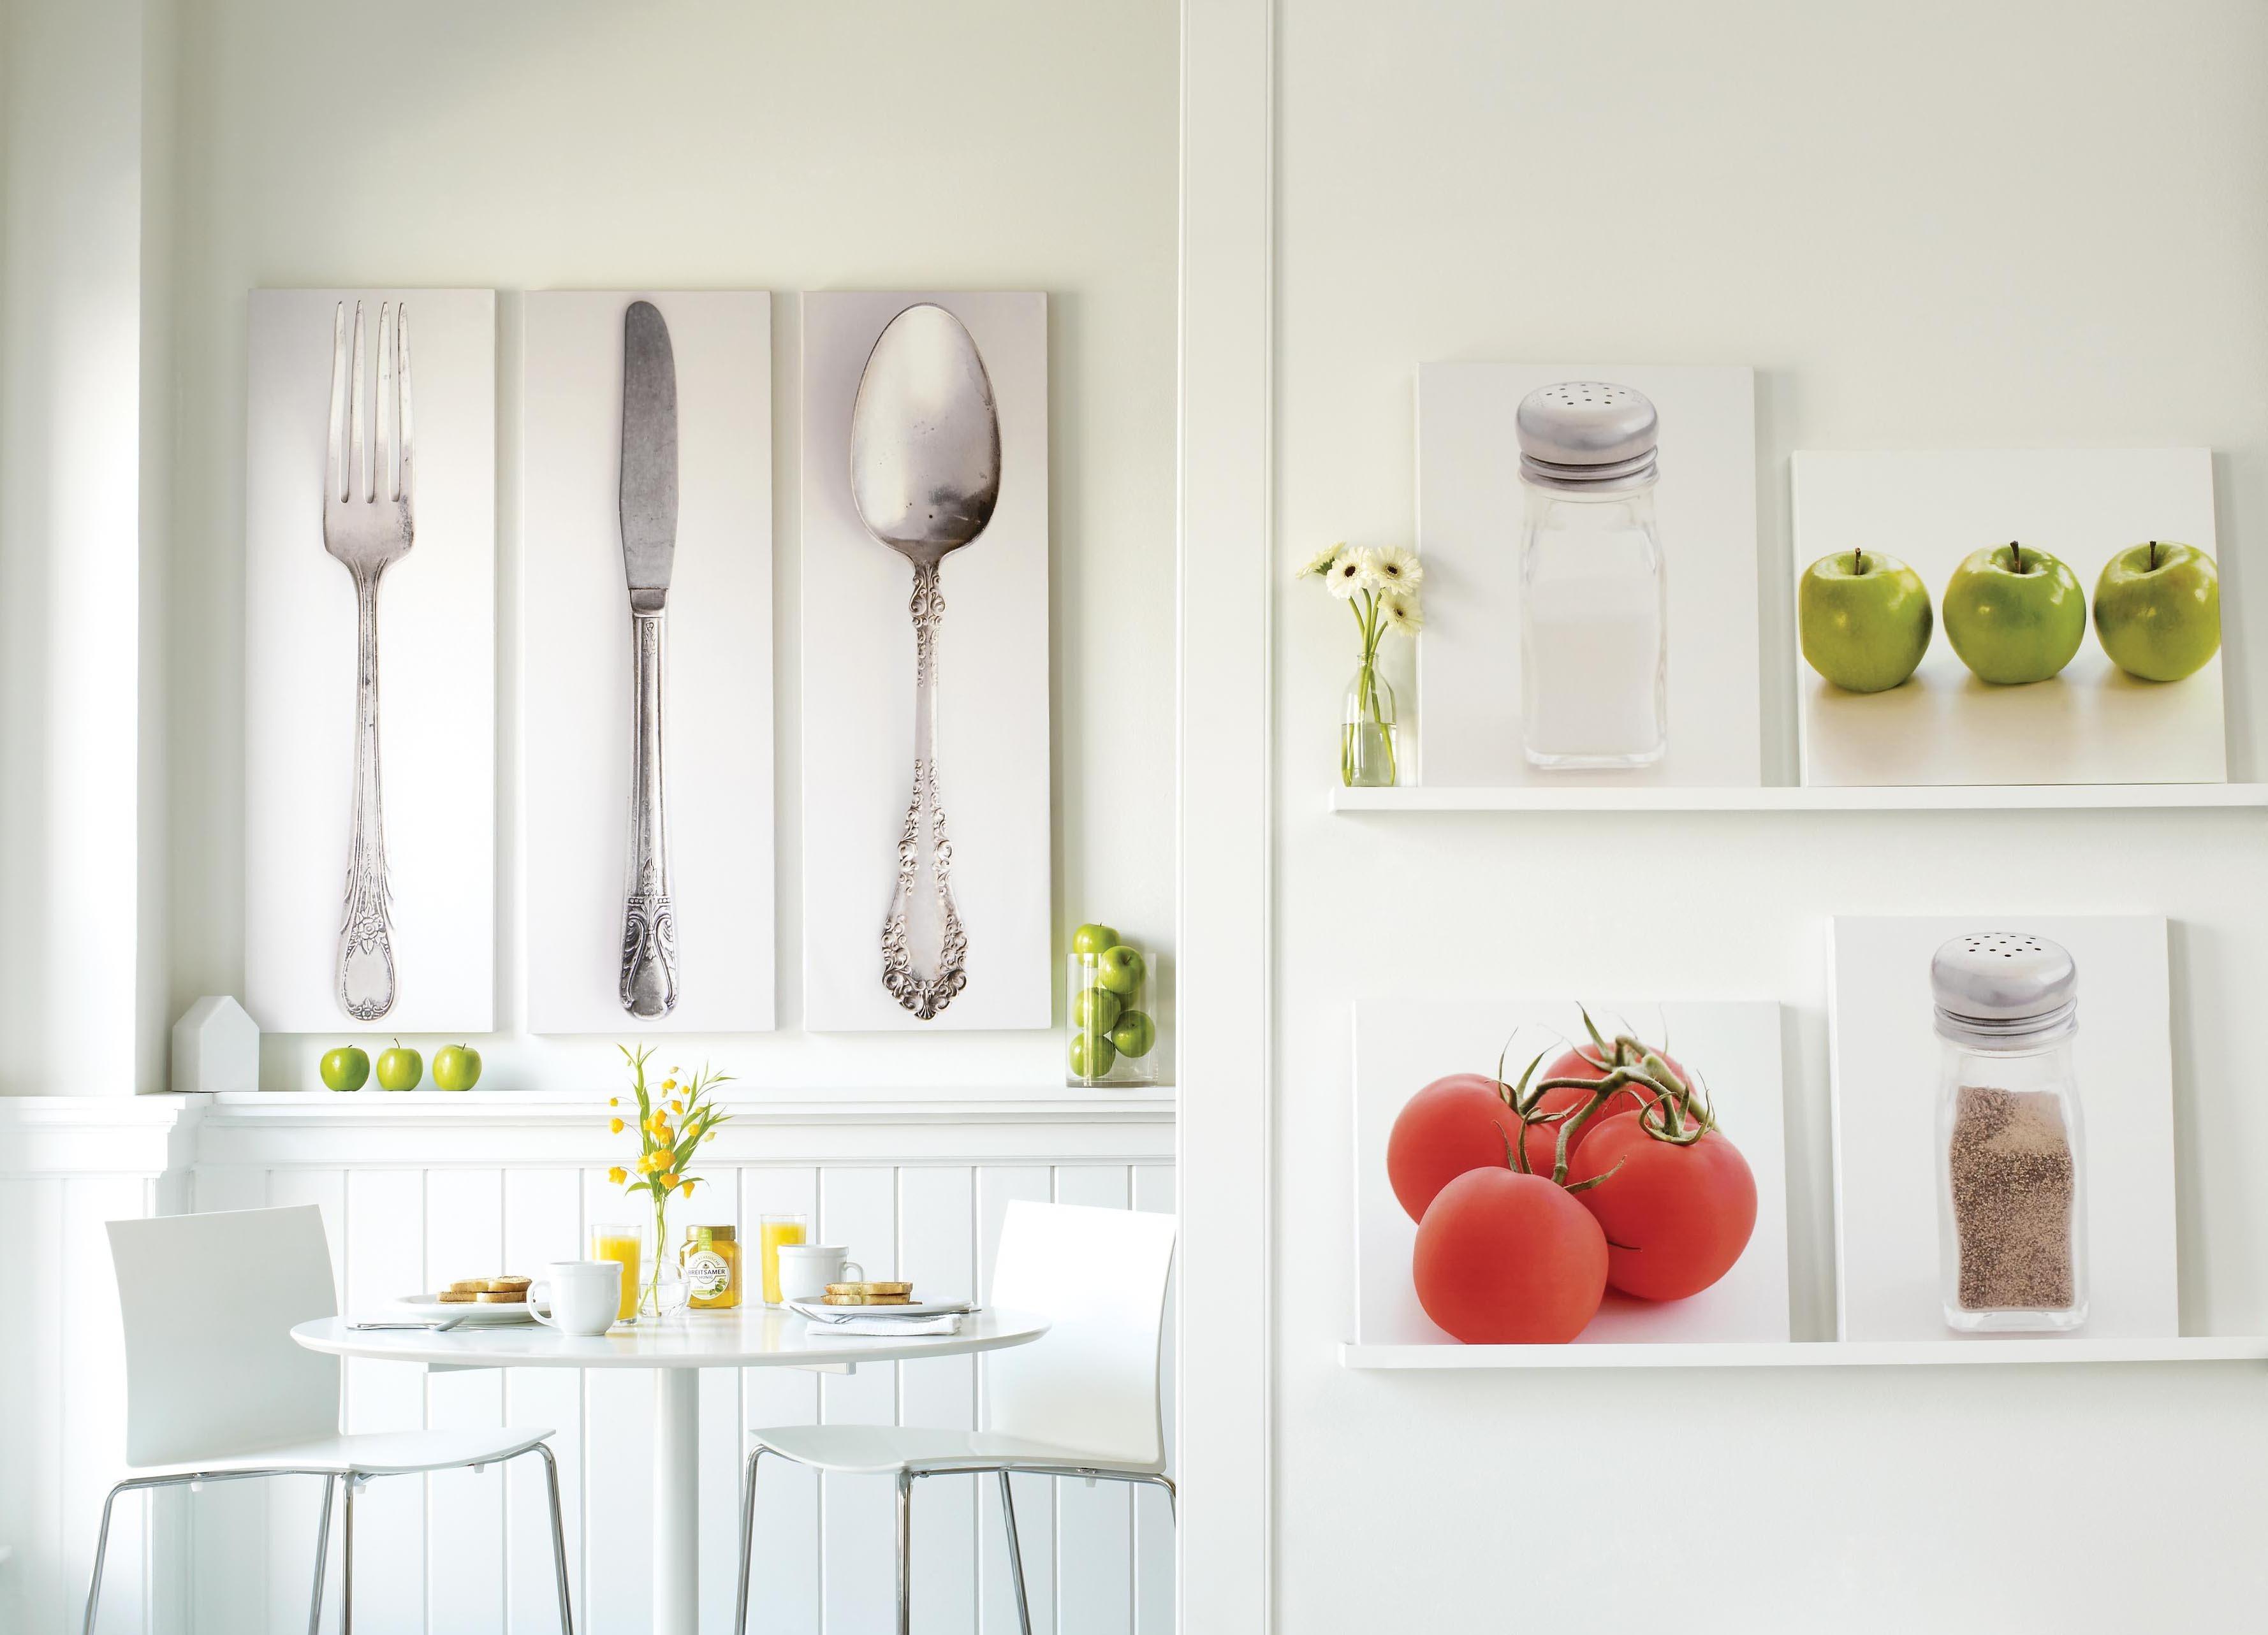 Wall Art Decor for Kitchen Inspirational Modern Kitchen Wall Art Wall Decoration Wall Decoration